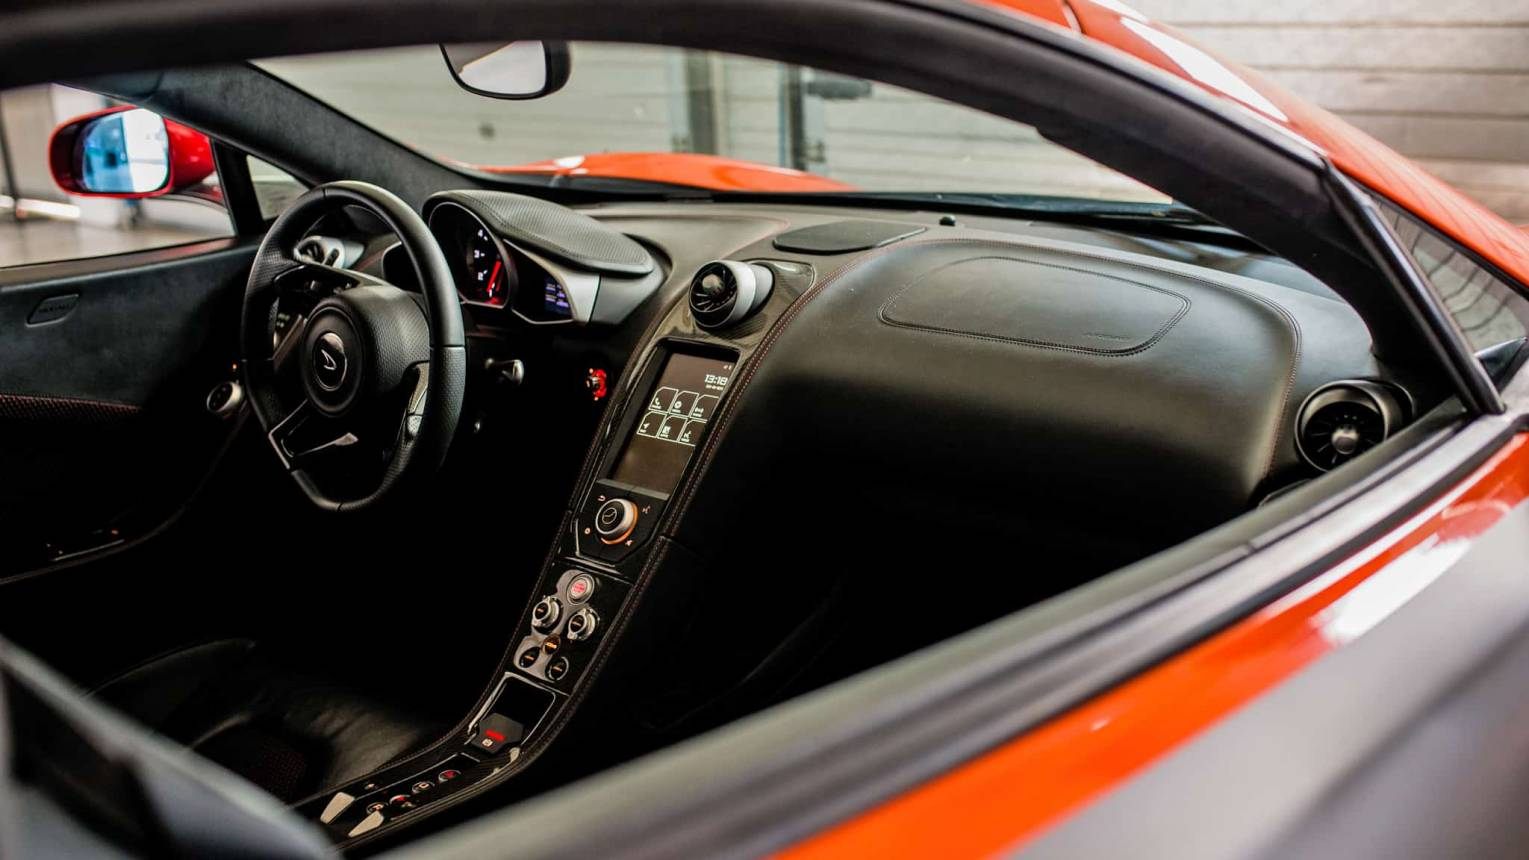 McLaren MP4-12C F1 vezetés az Euroringen